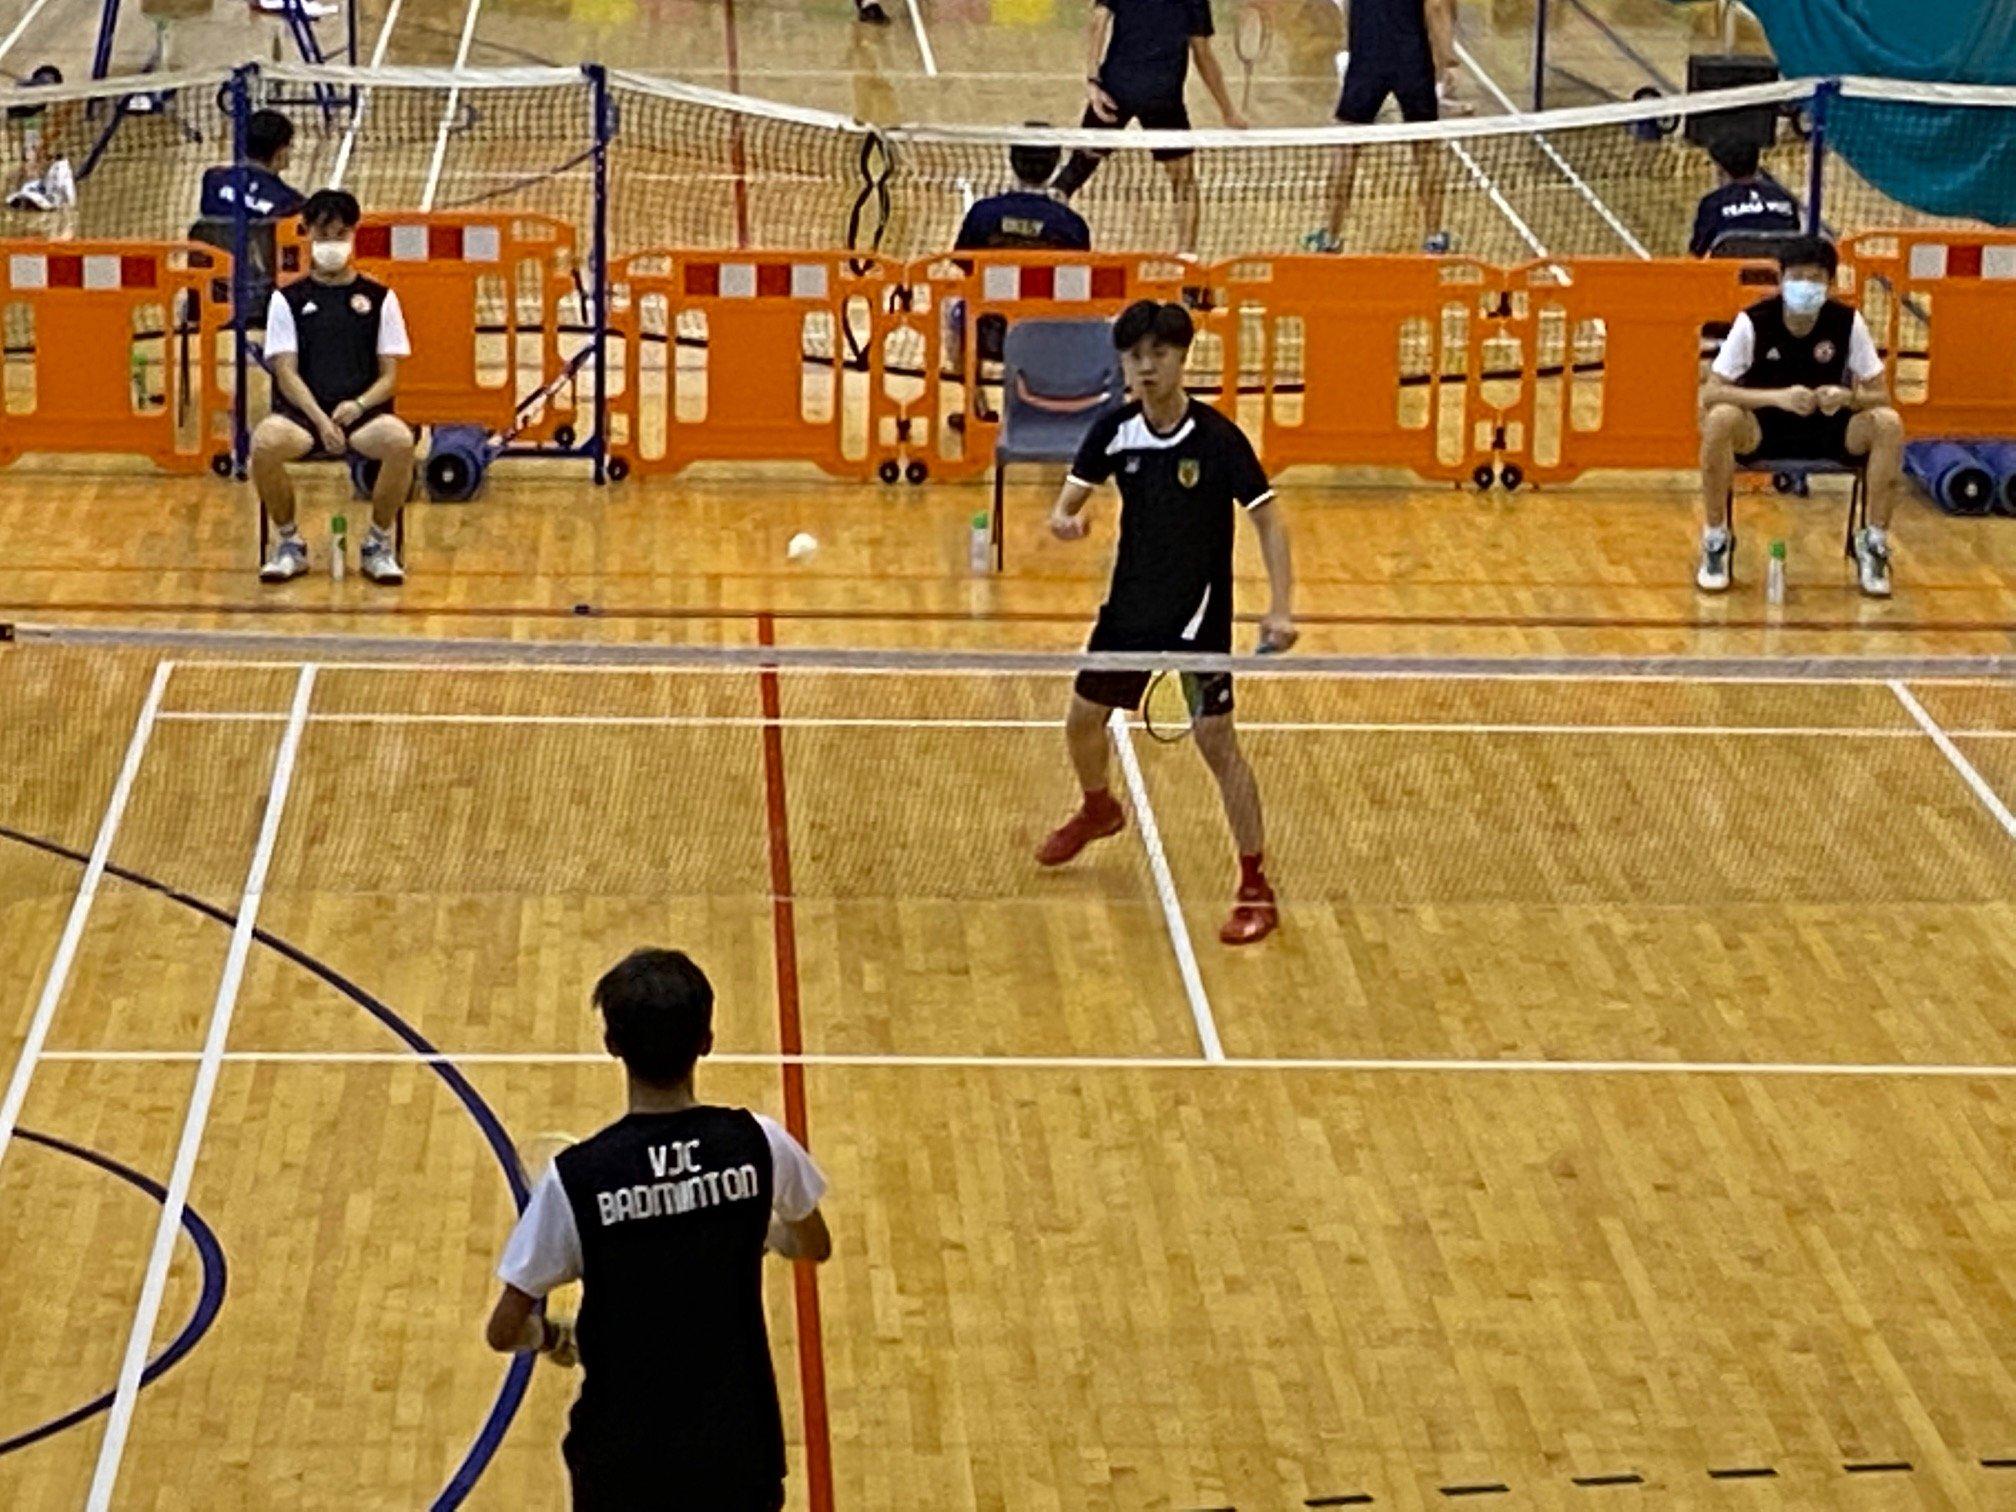 NSG A Div boys badminton - RI vs VJC first singles